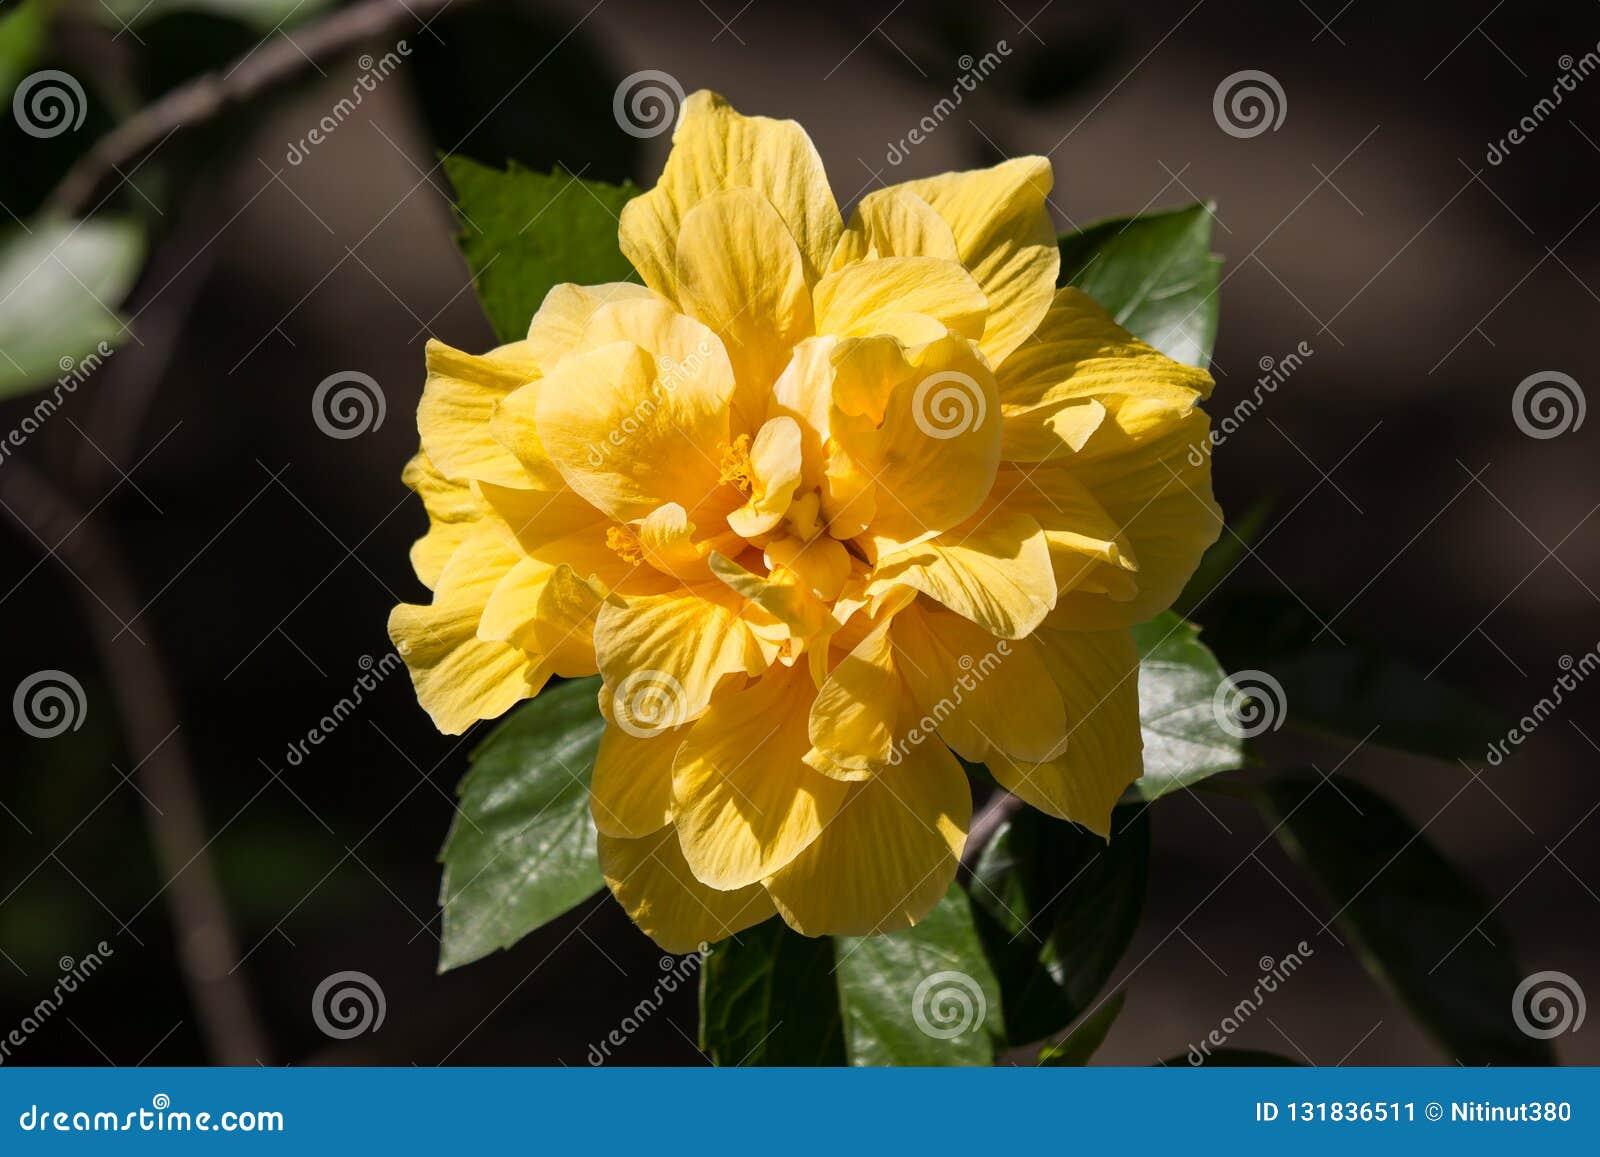 Yellow Hibiscus Flower in black dard background